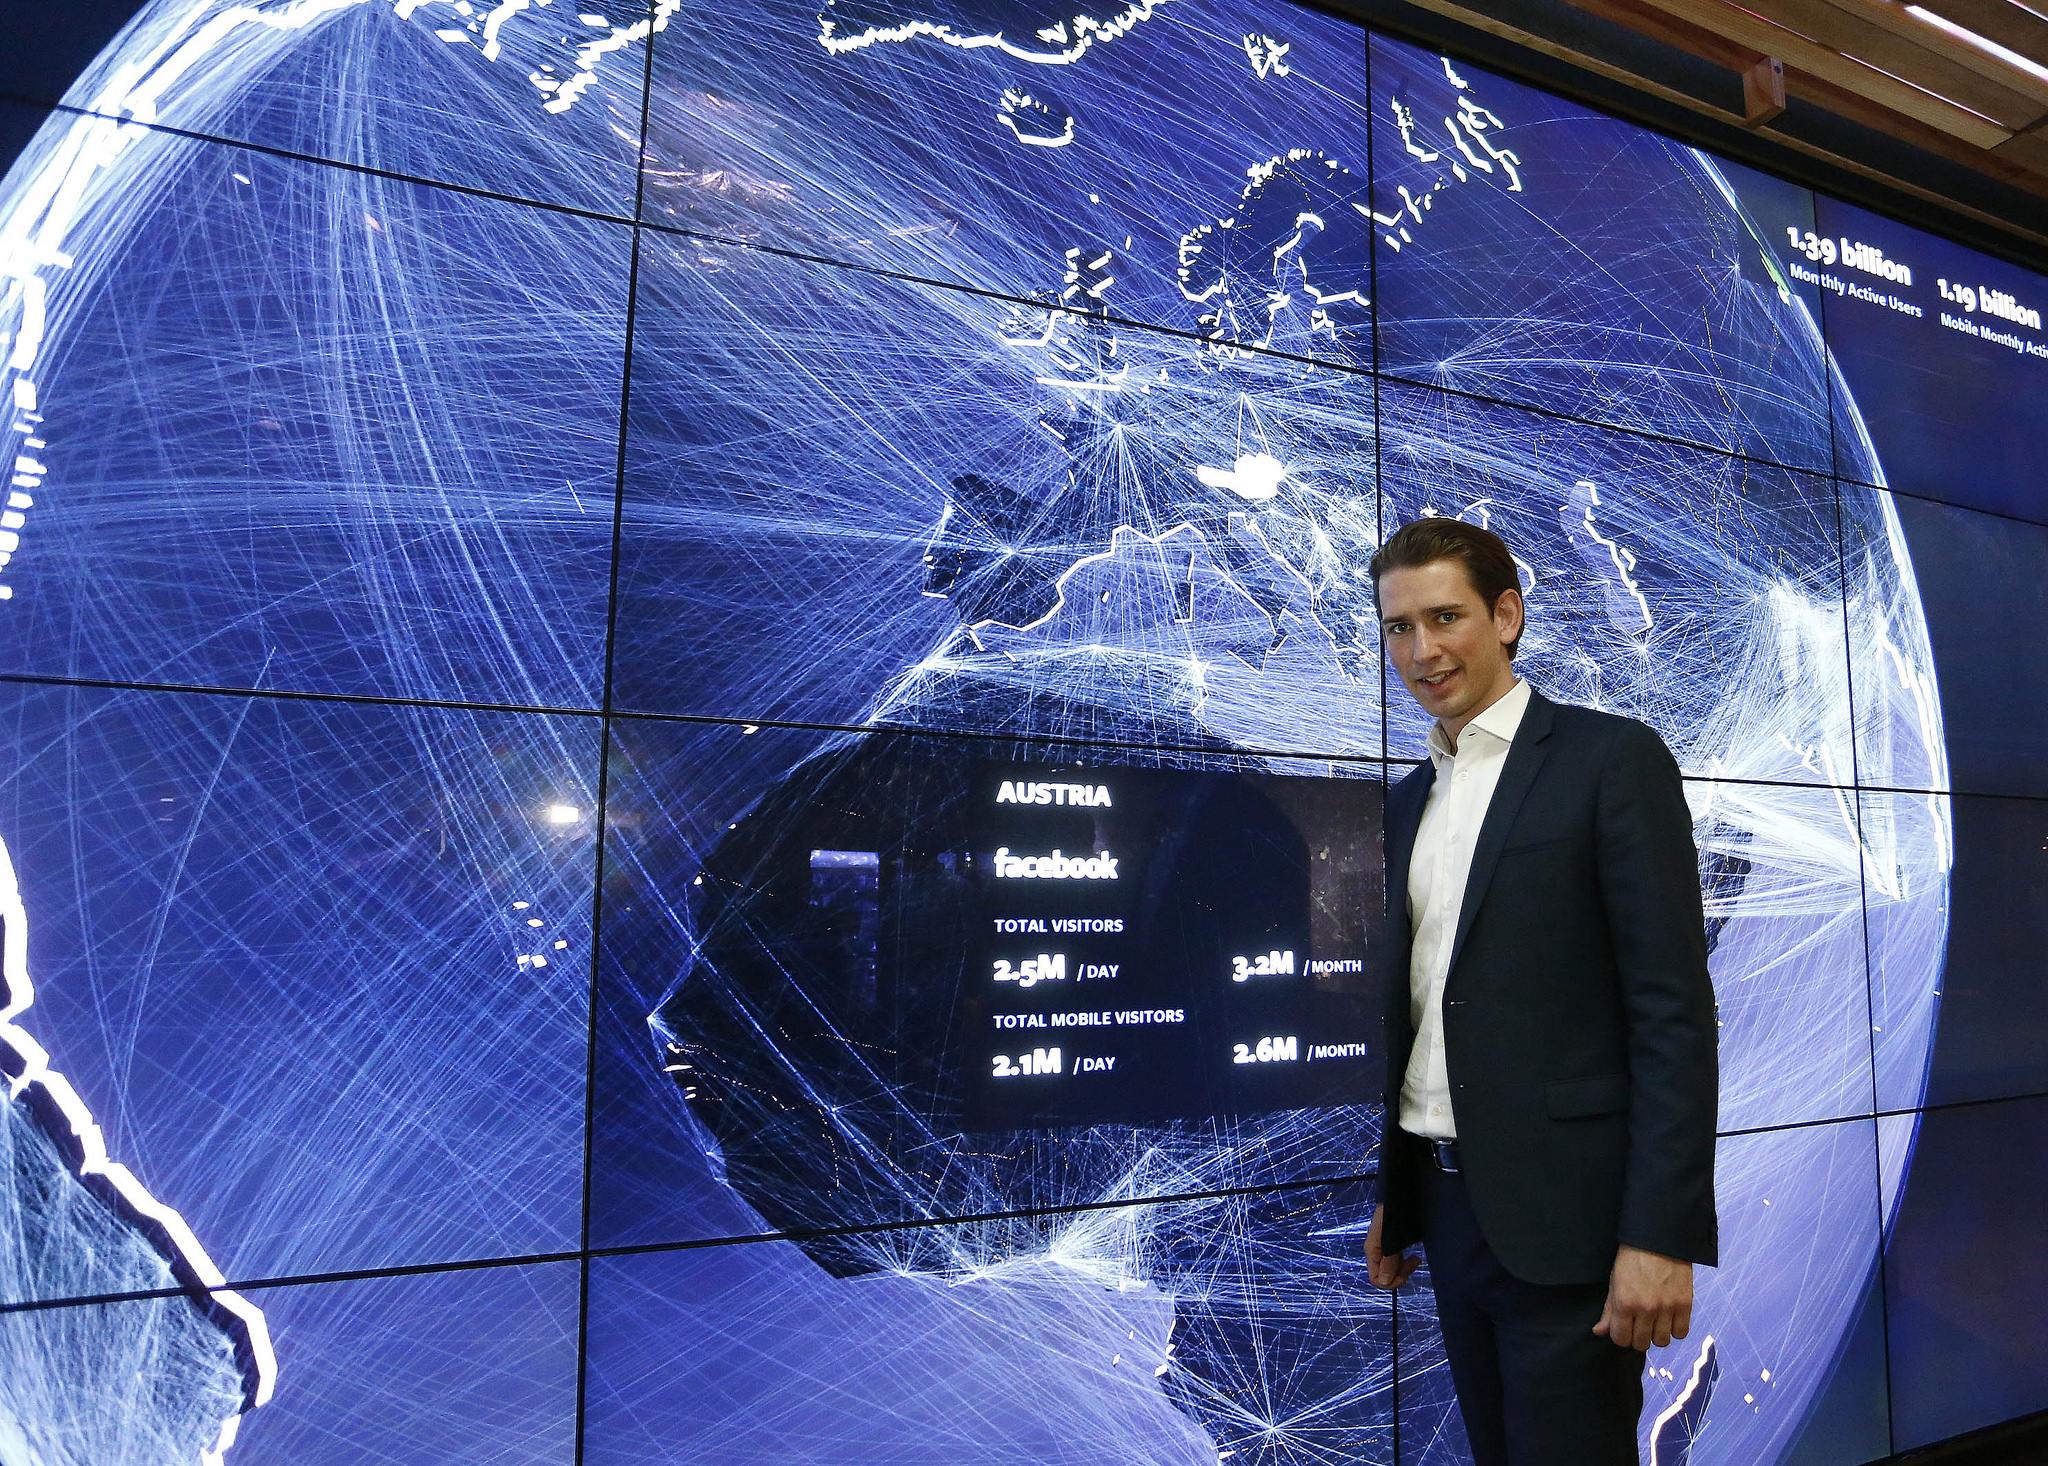 Foreign Minister Sebastian Kurz at Facebook headquarters. Photo: Dragan Tatic.